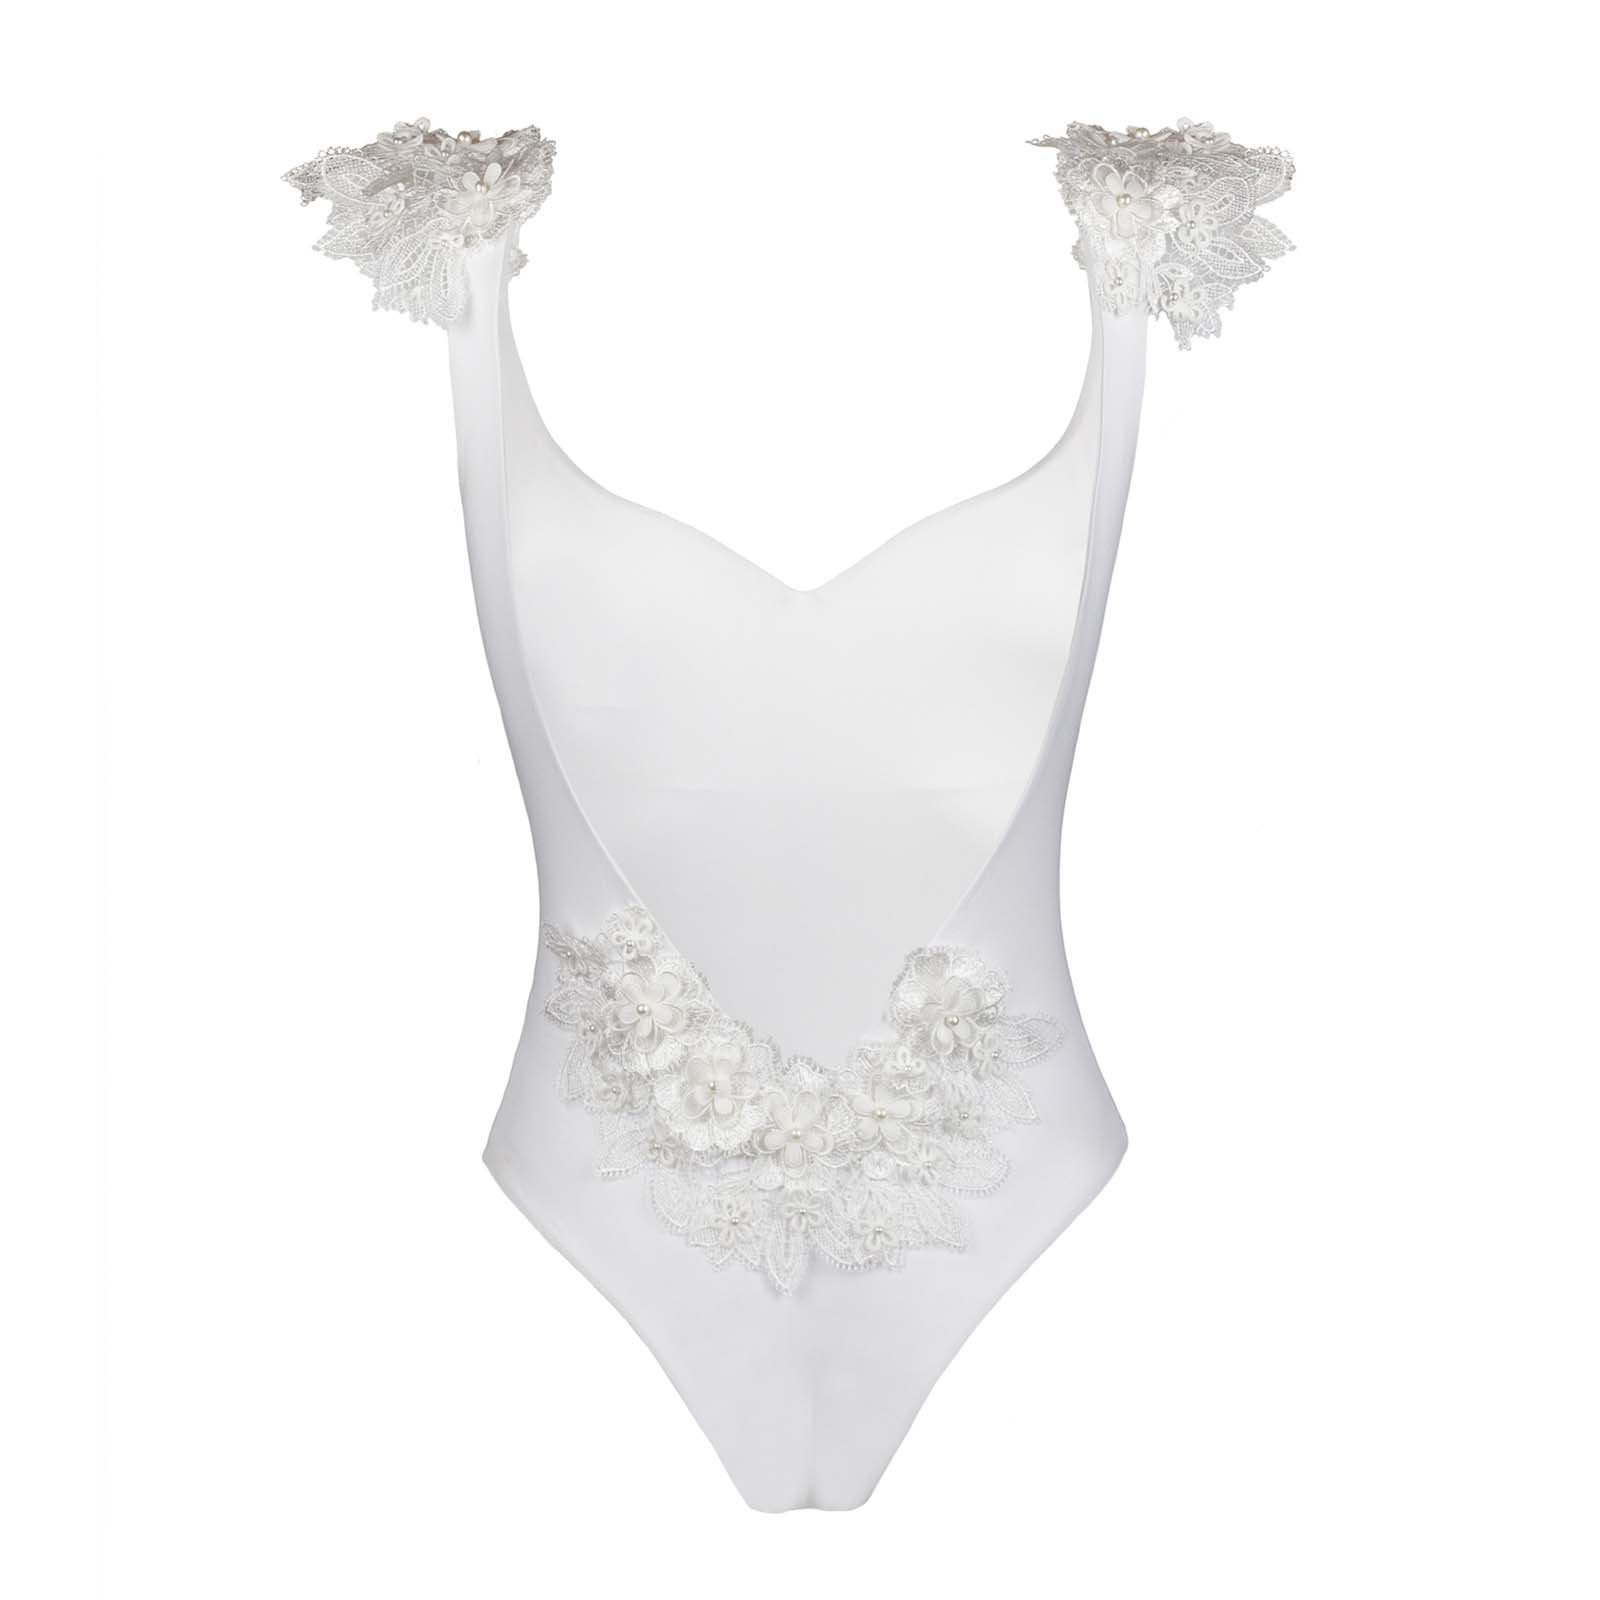 Kinda 3D Swimwear Reina white swimsuit bikini bianco con pizzo with lace_front